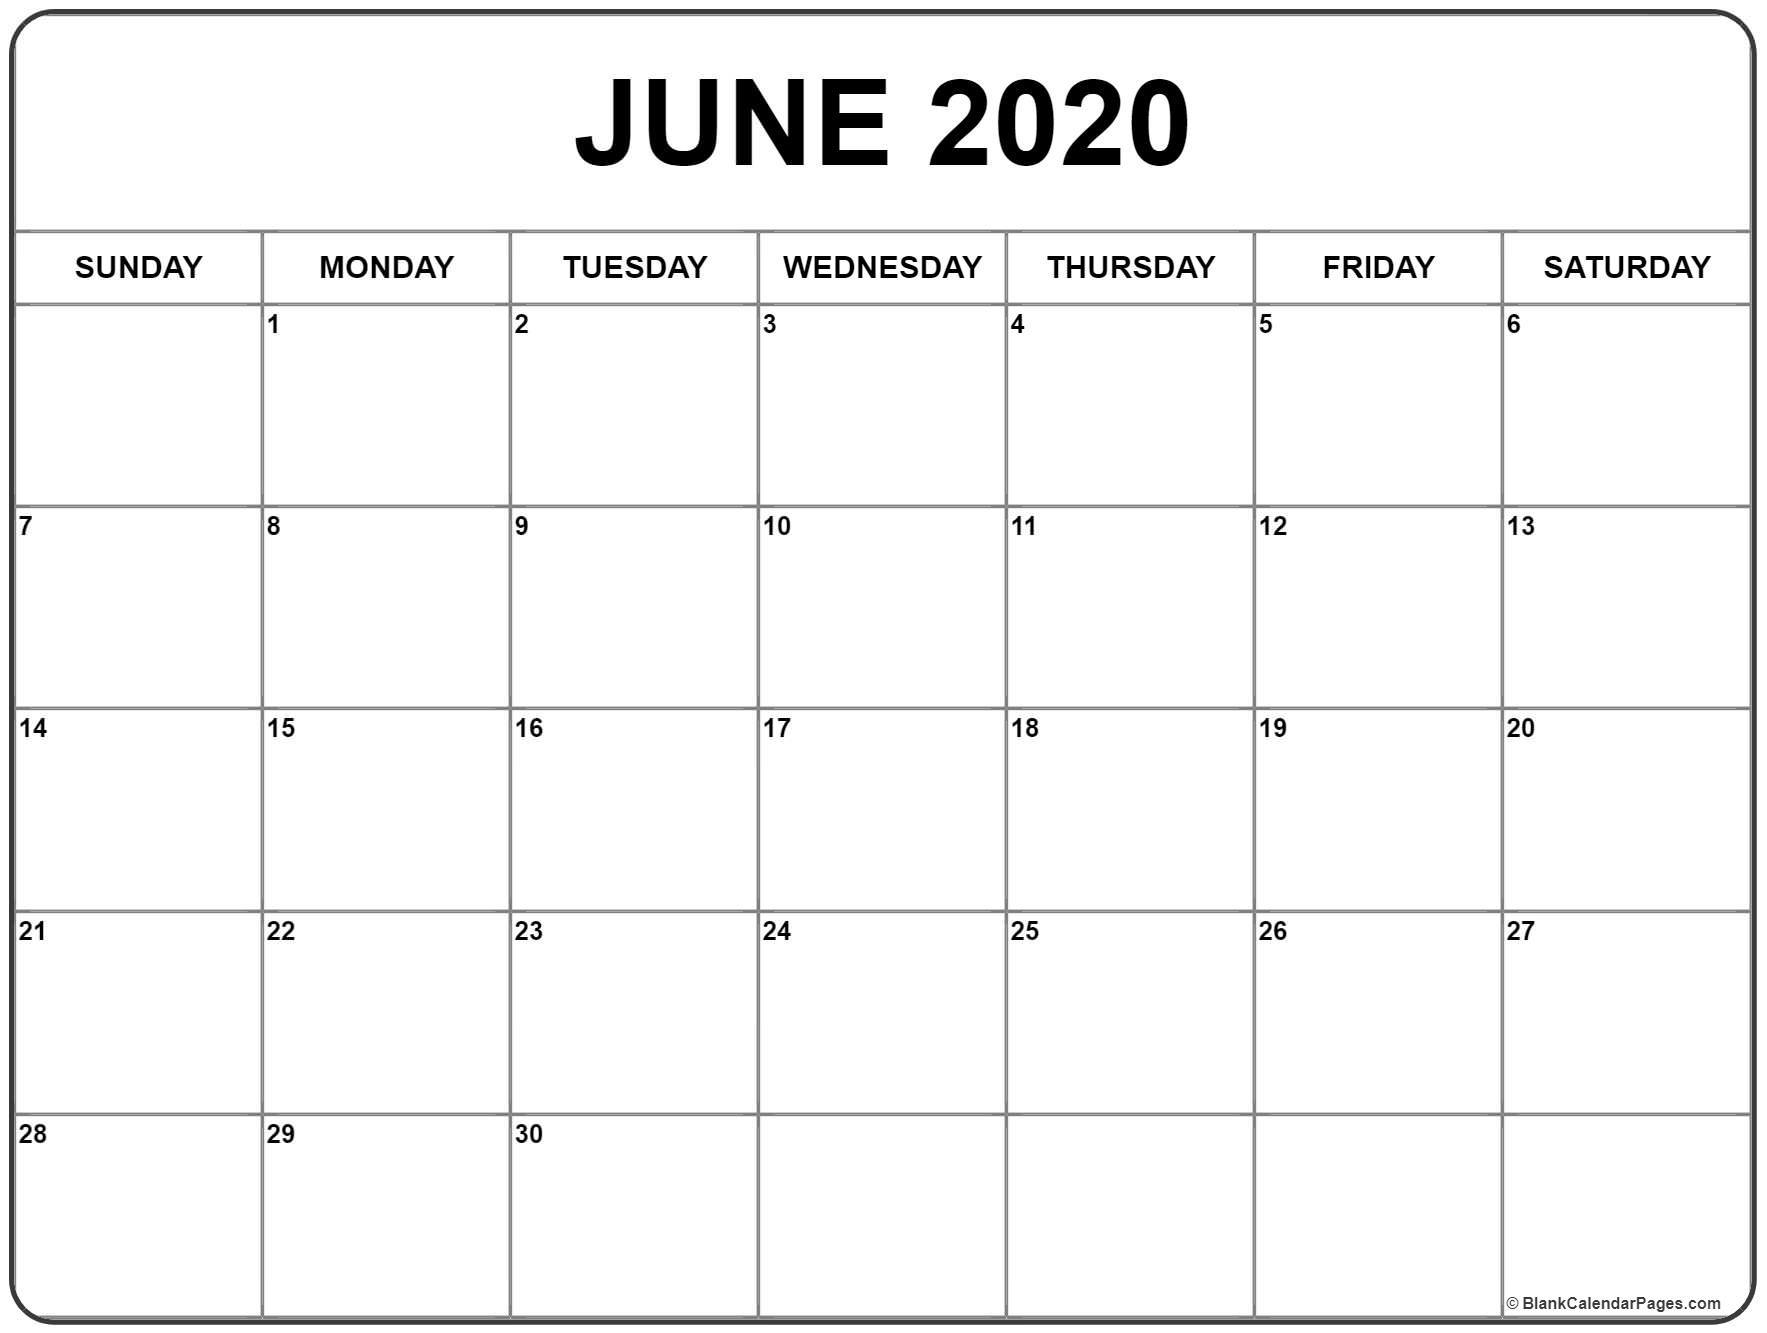 June 2020 Calendar | Free Printable Monthly Calendars_Blank Calendar Template June 2020